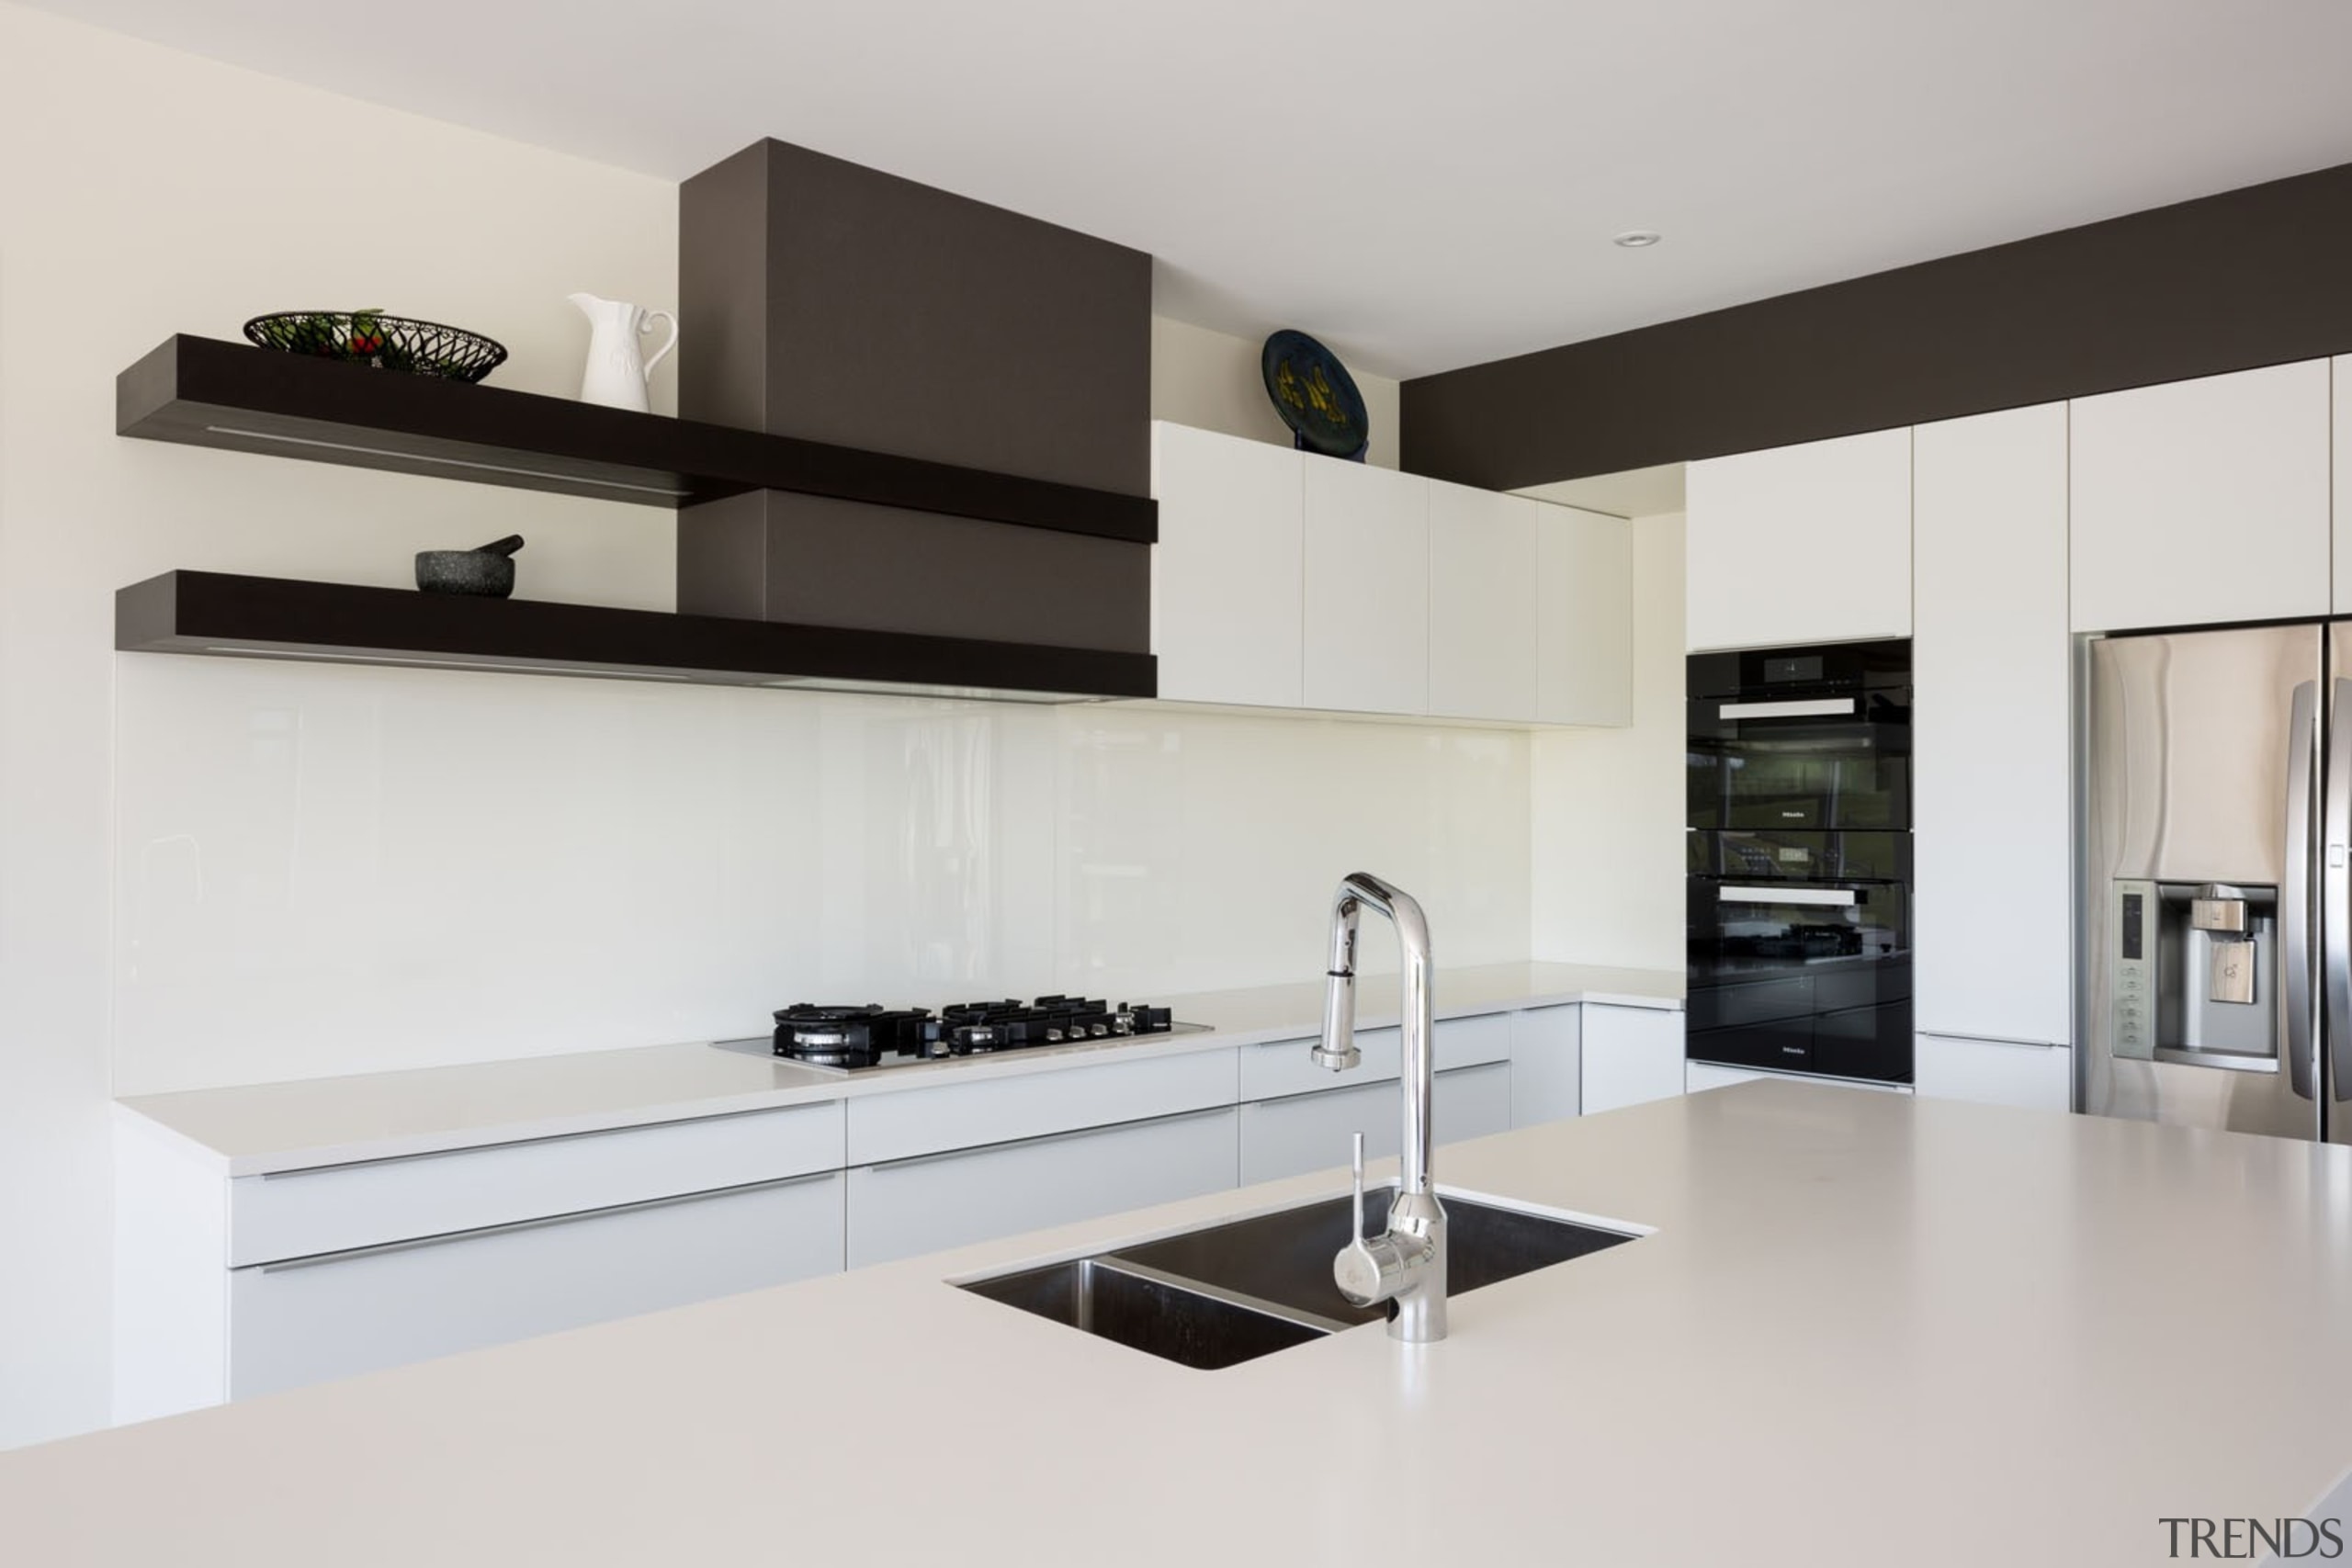 IMGL9864-12 - Dairy Flat Kitchen - countertop | countertop, furniture, interior design, kitchen, product design, gray